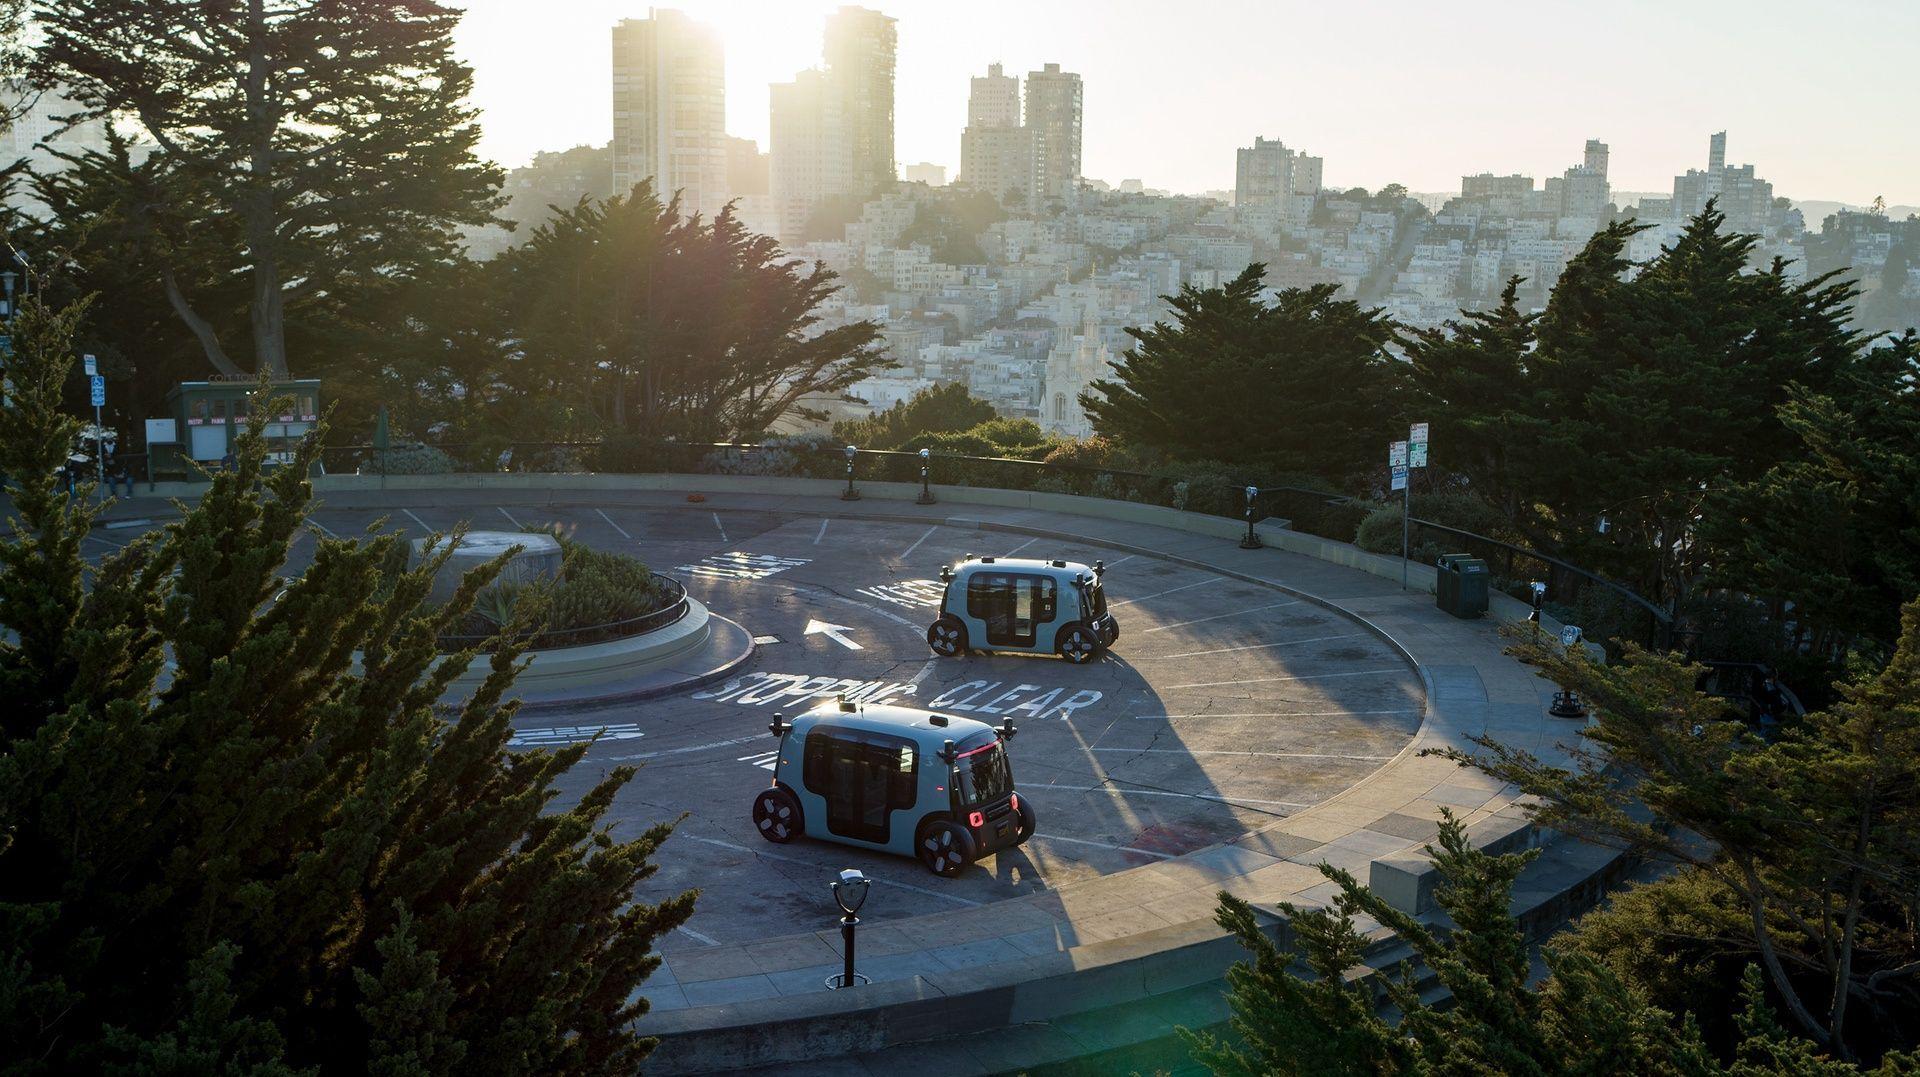 Zoox-Autonomous-Vehicle-Two-Vehicle-Coit-Tower-SF